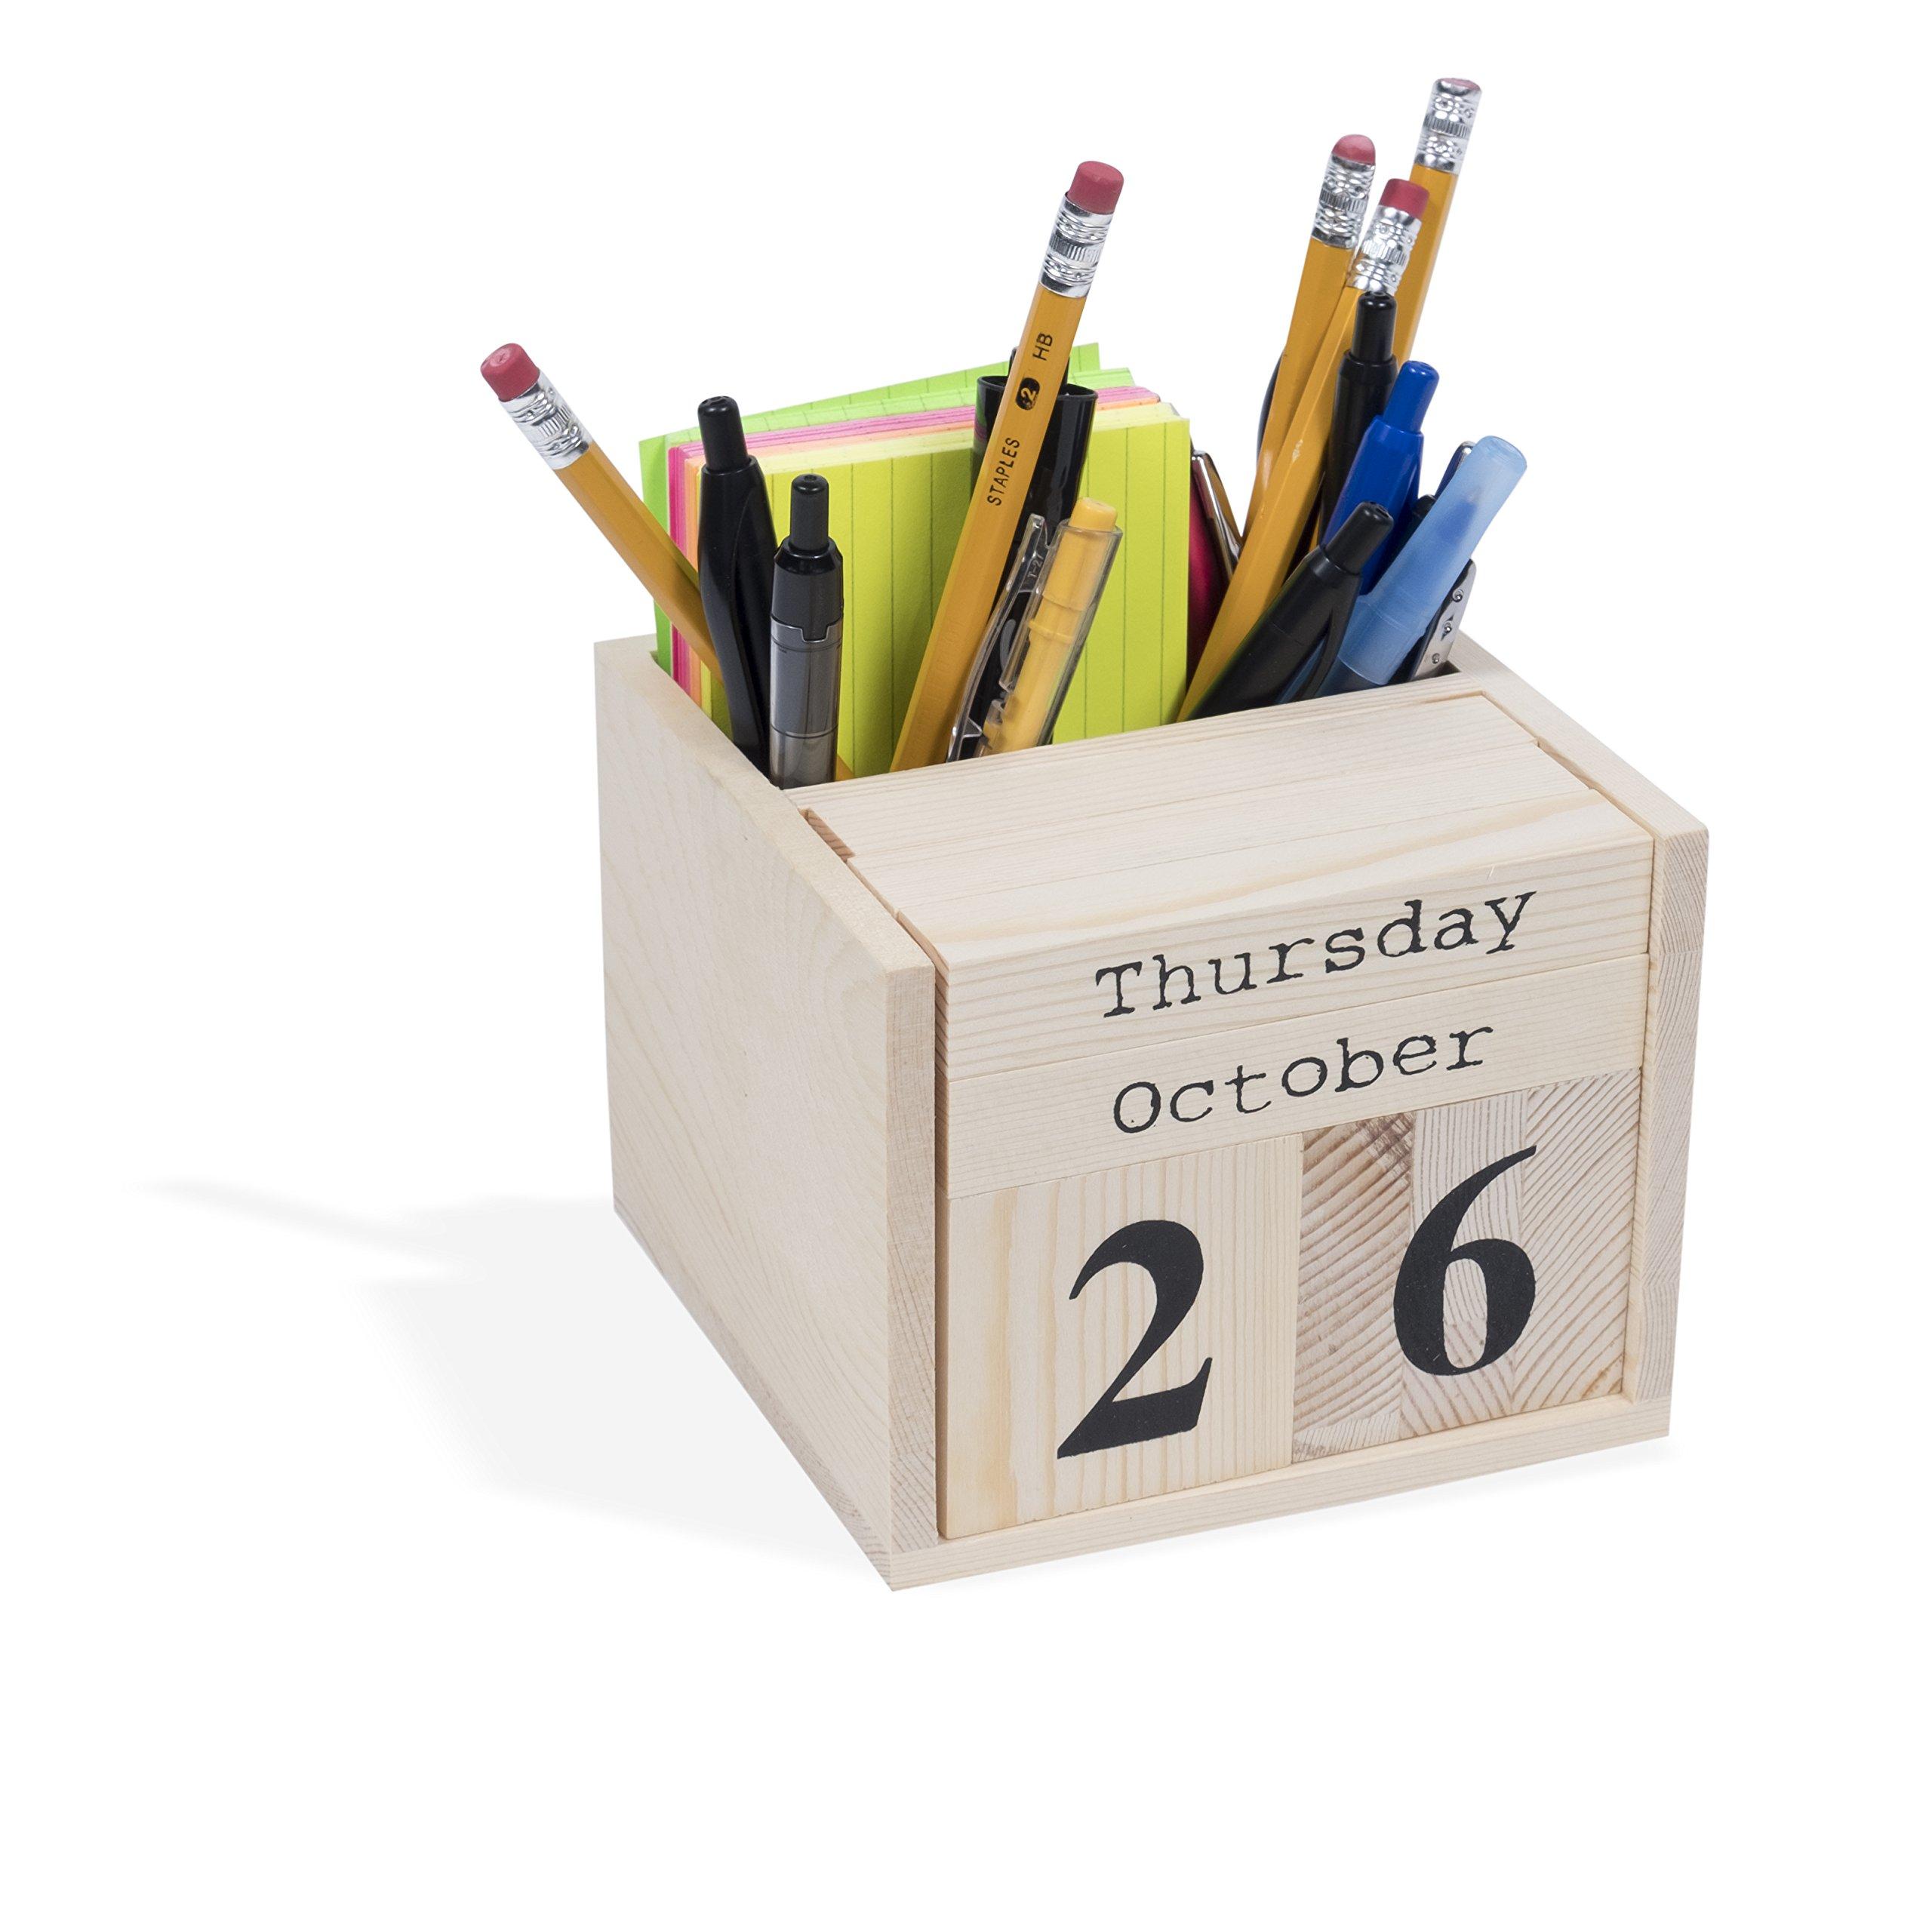 Office or Home Decorative Cube Desktop Block Calendar Pen Holder Unfinished Wood for DIY Projects Natural